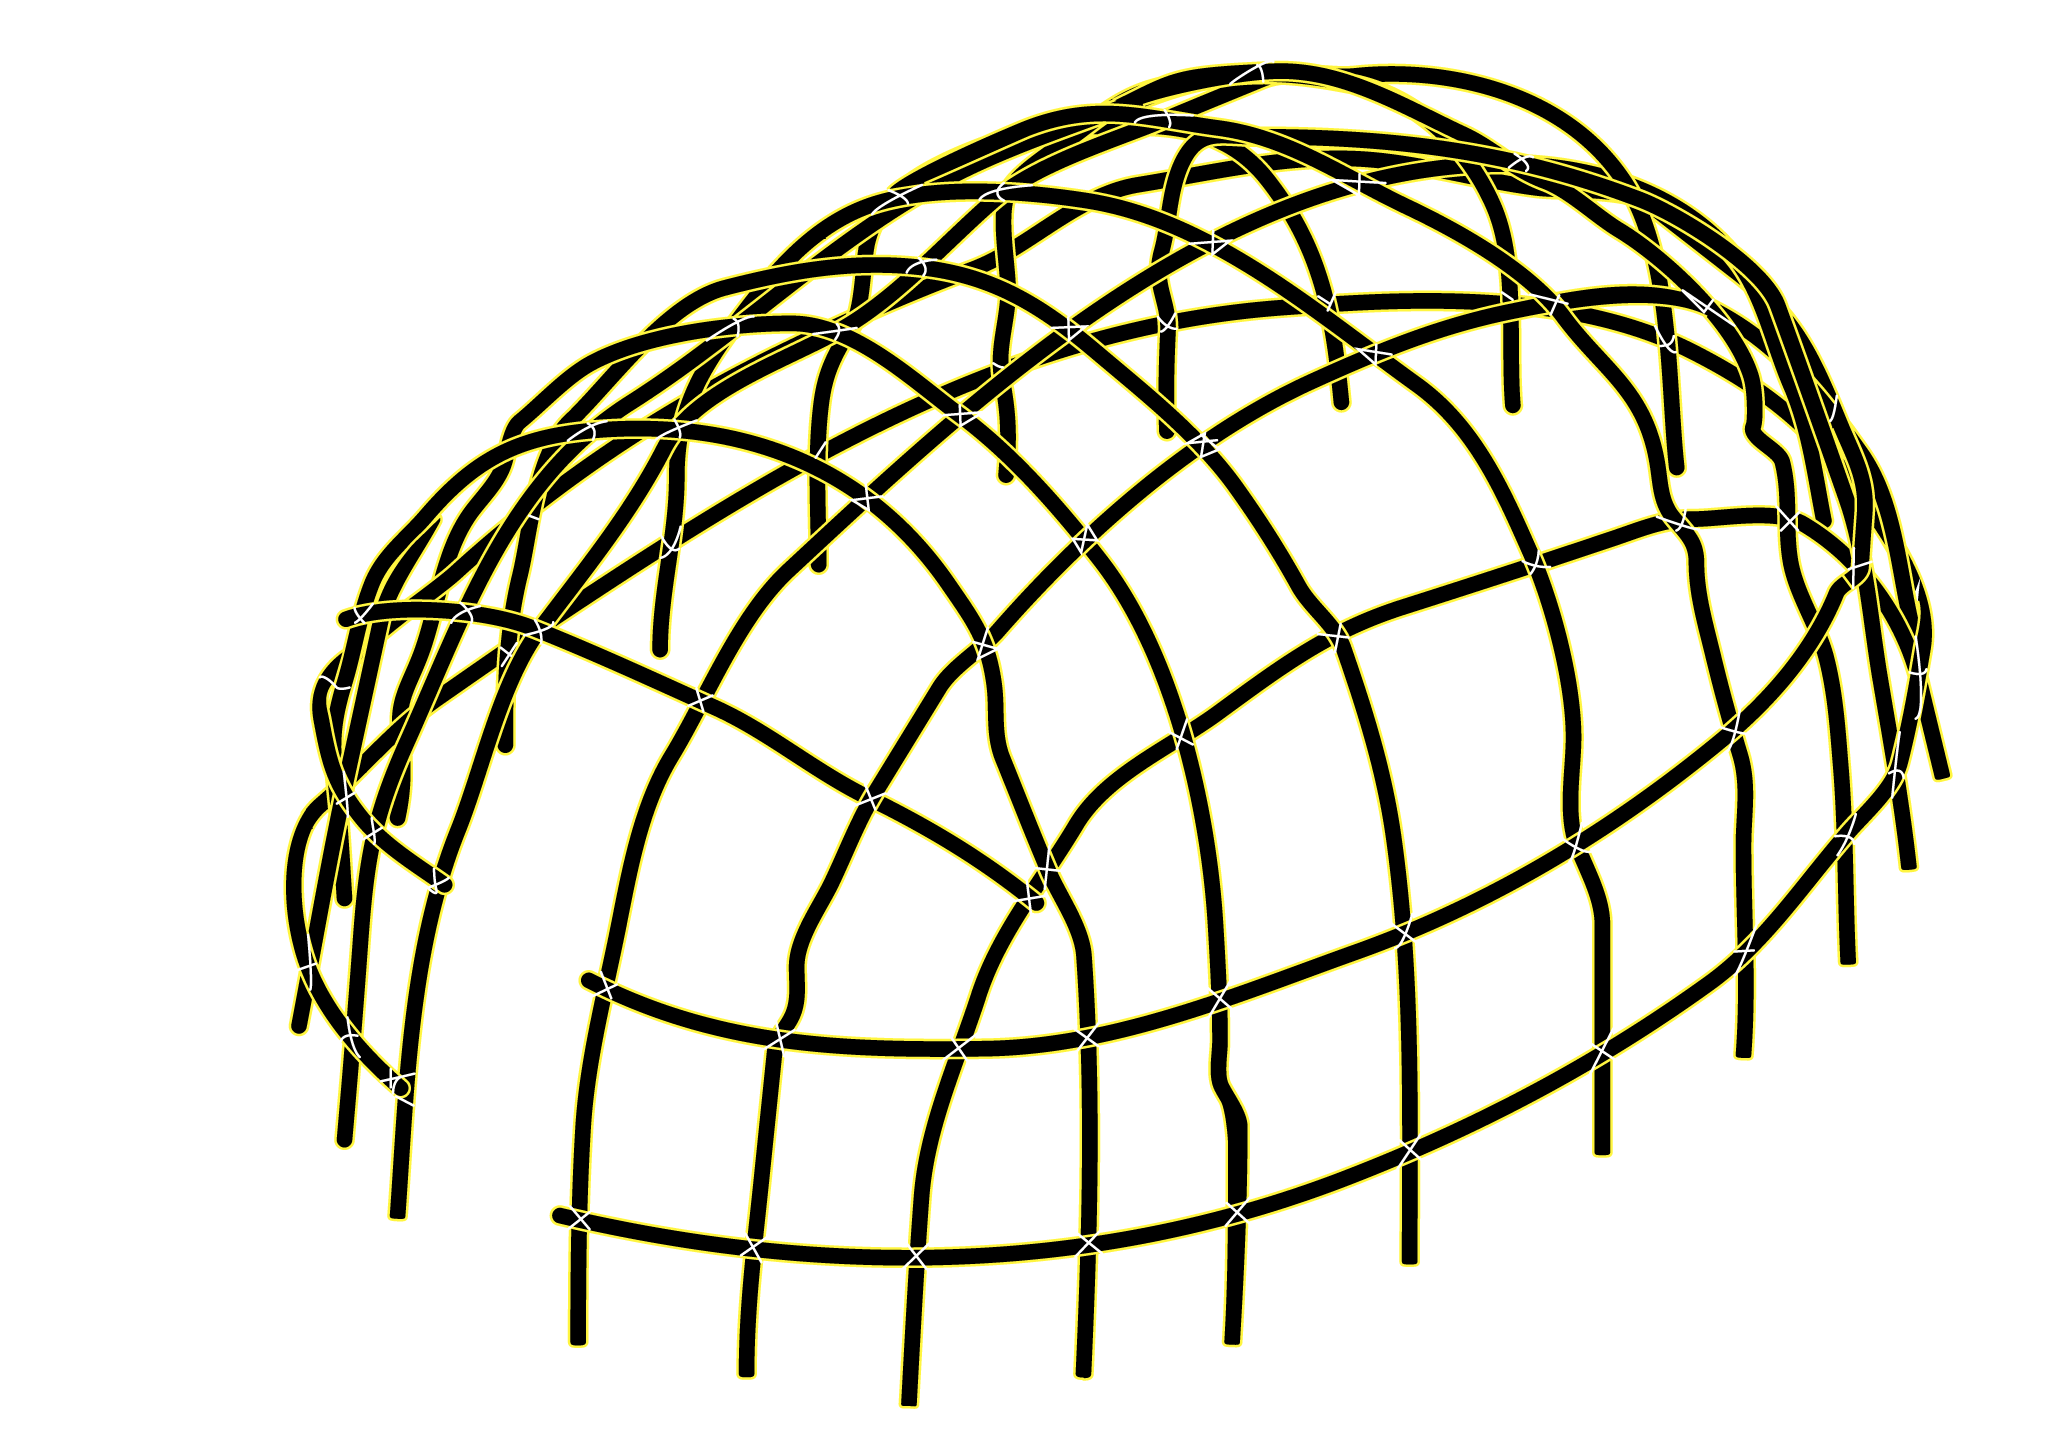 2048x1447 History Of The Spline Computational Curve And Design